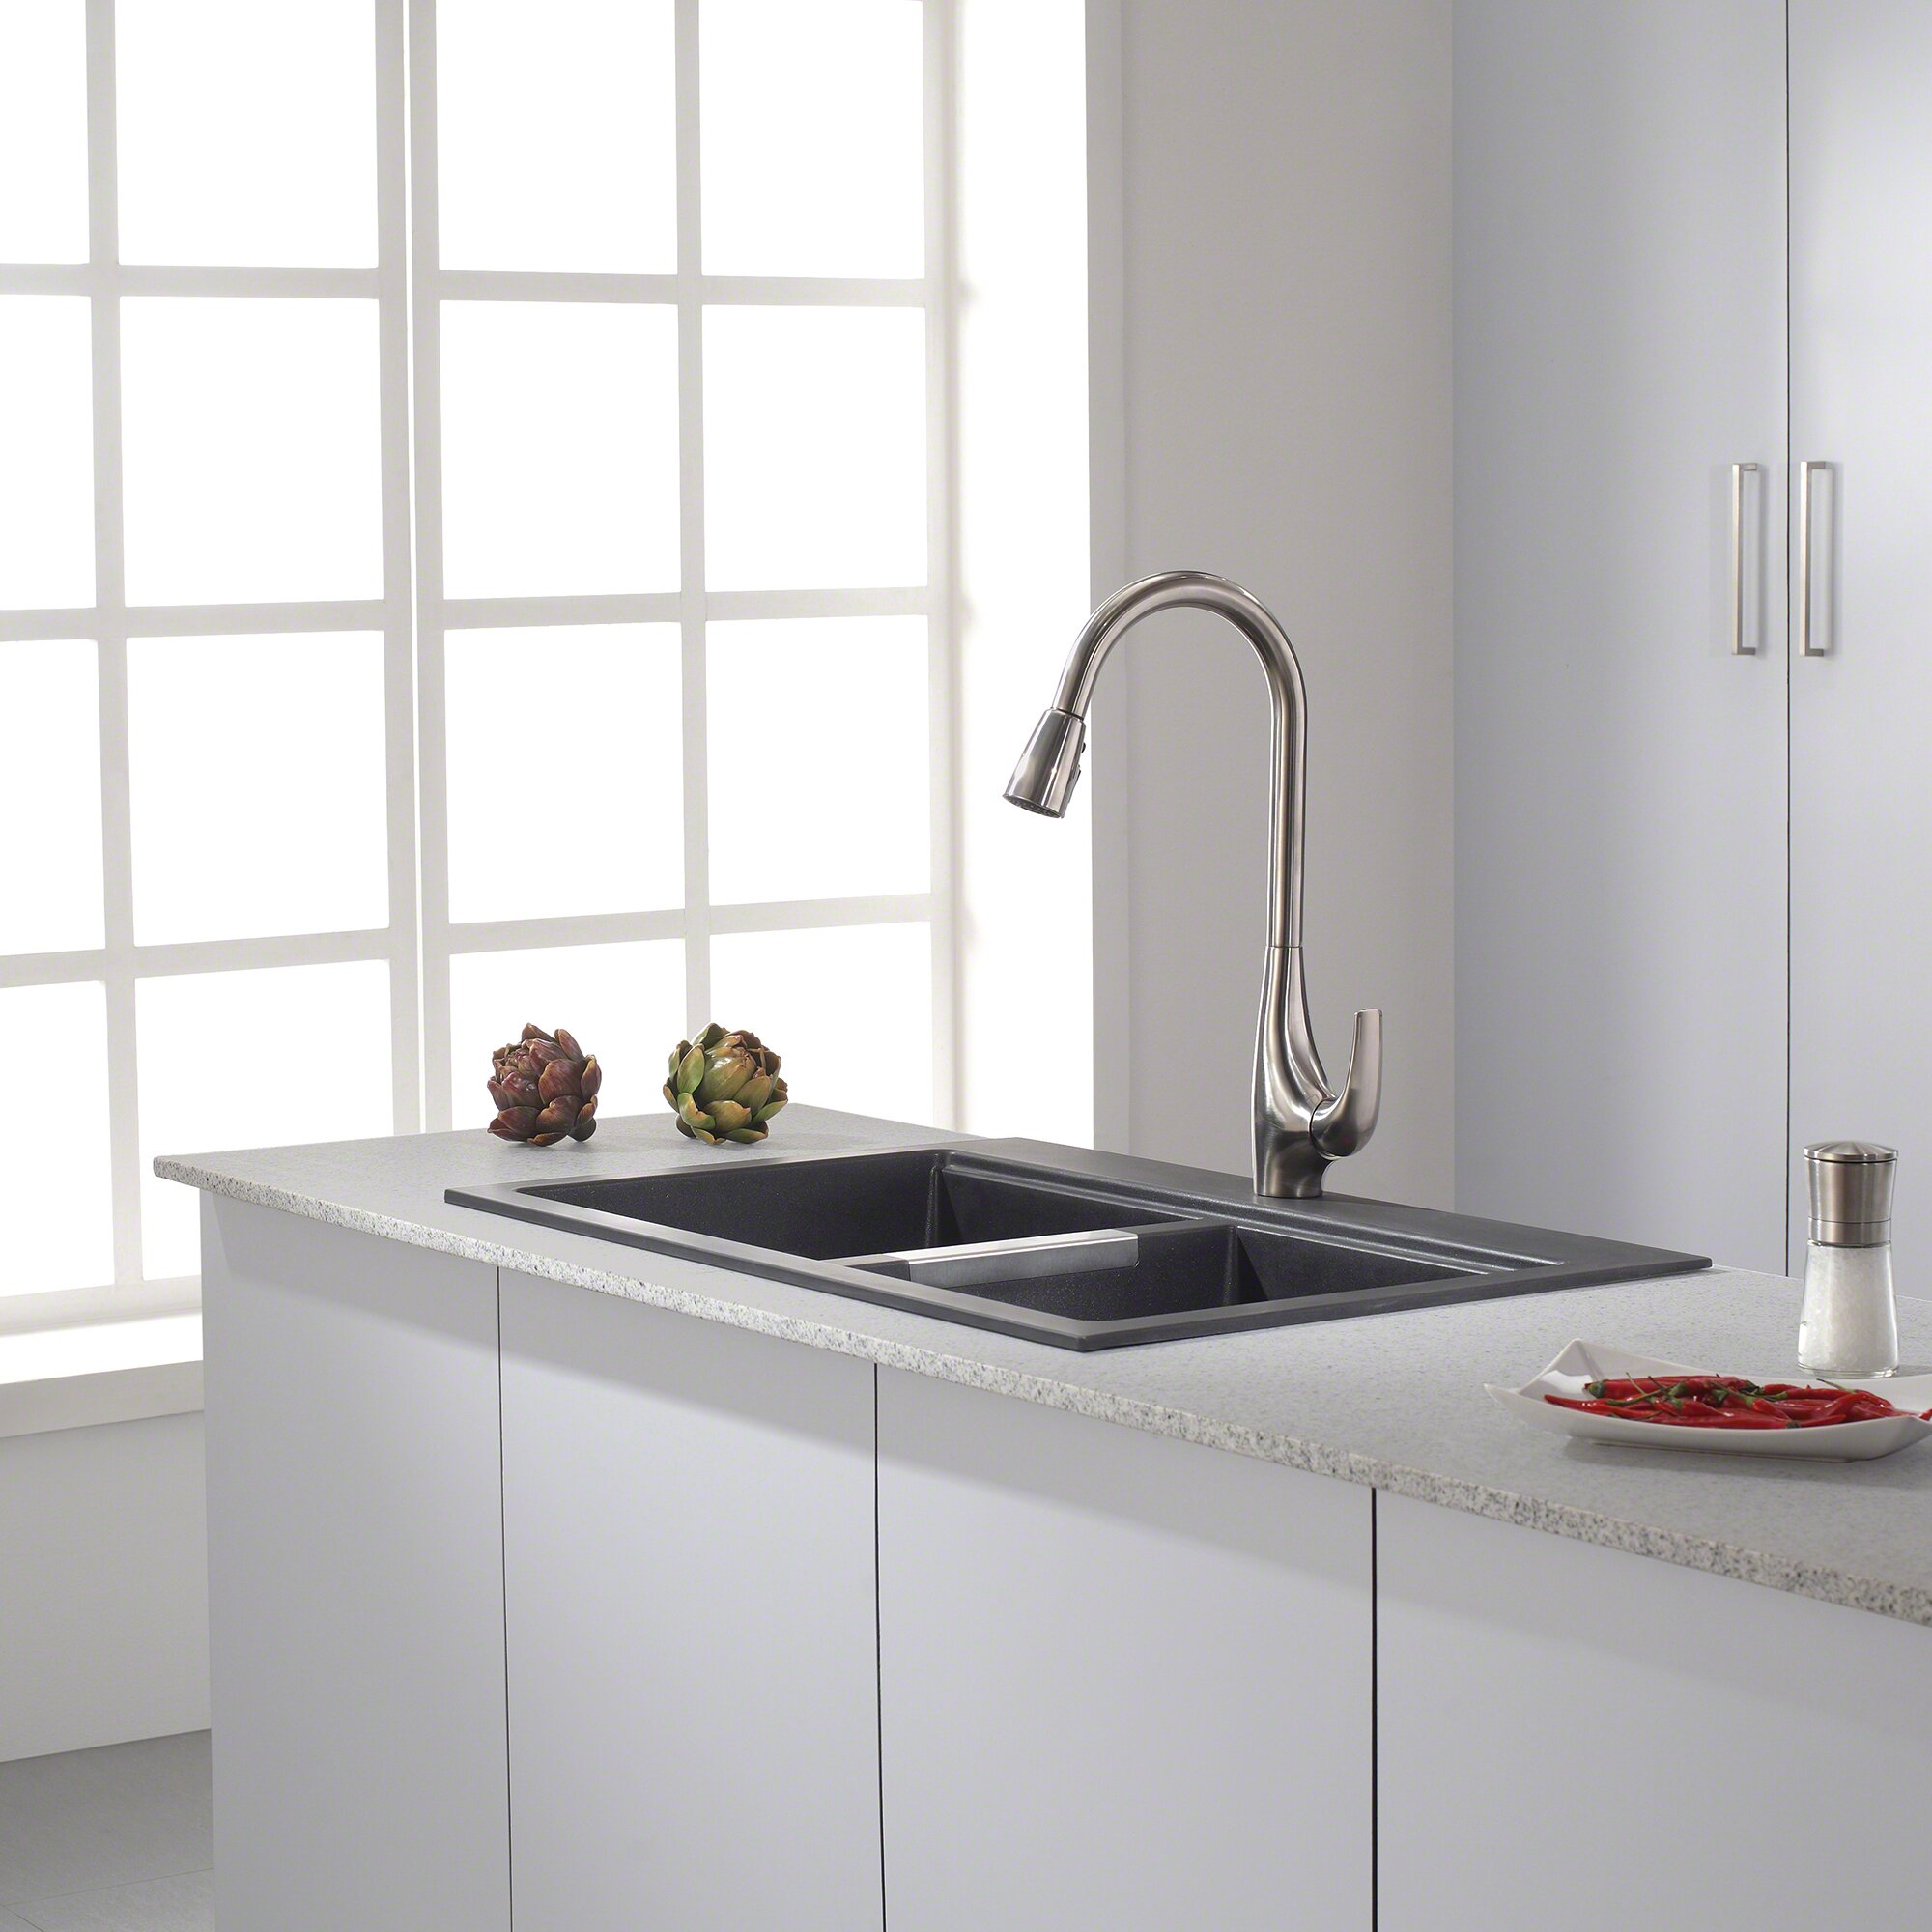 Kraus Kitchen Sink Reviews : Kraus 33.5